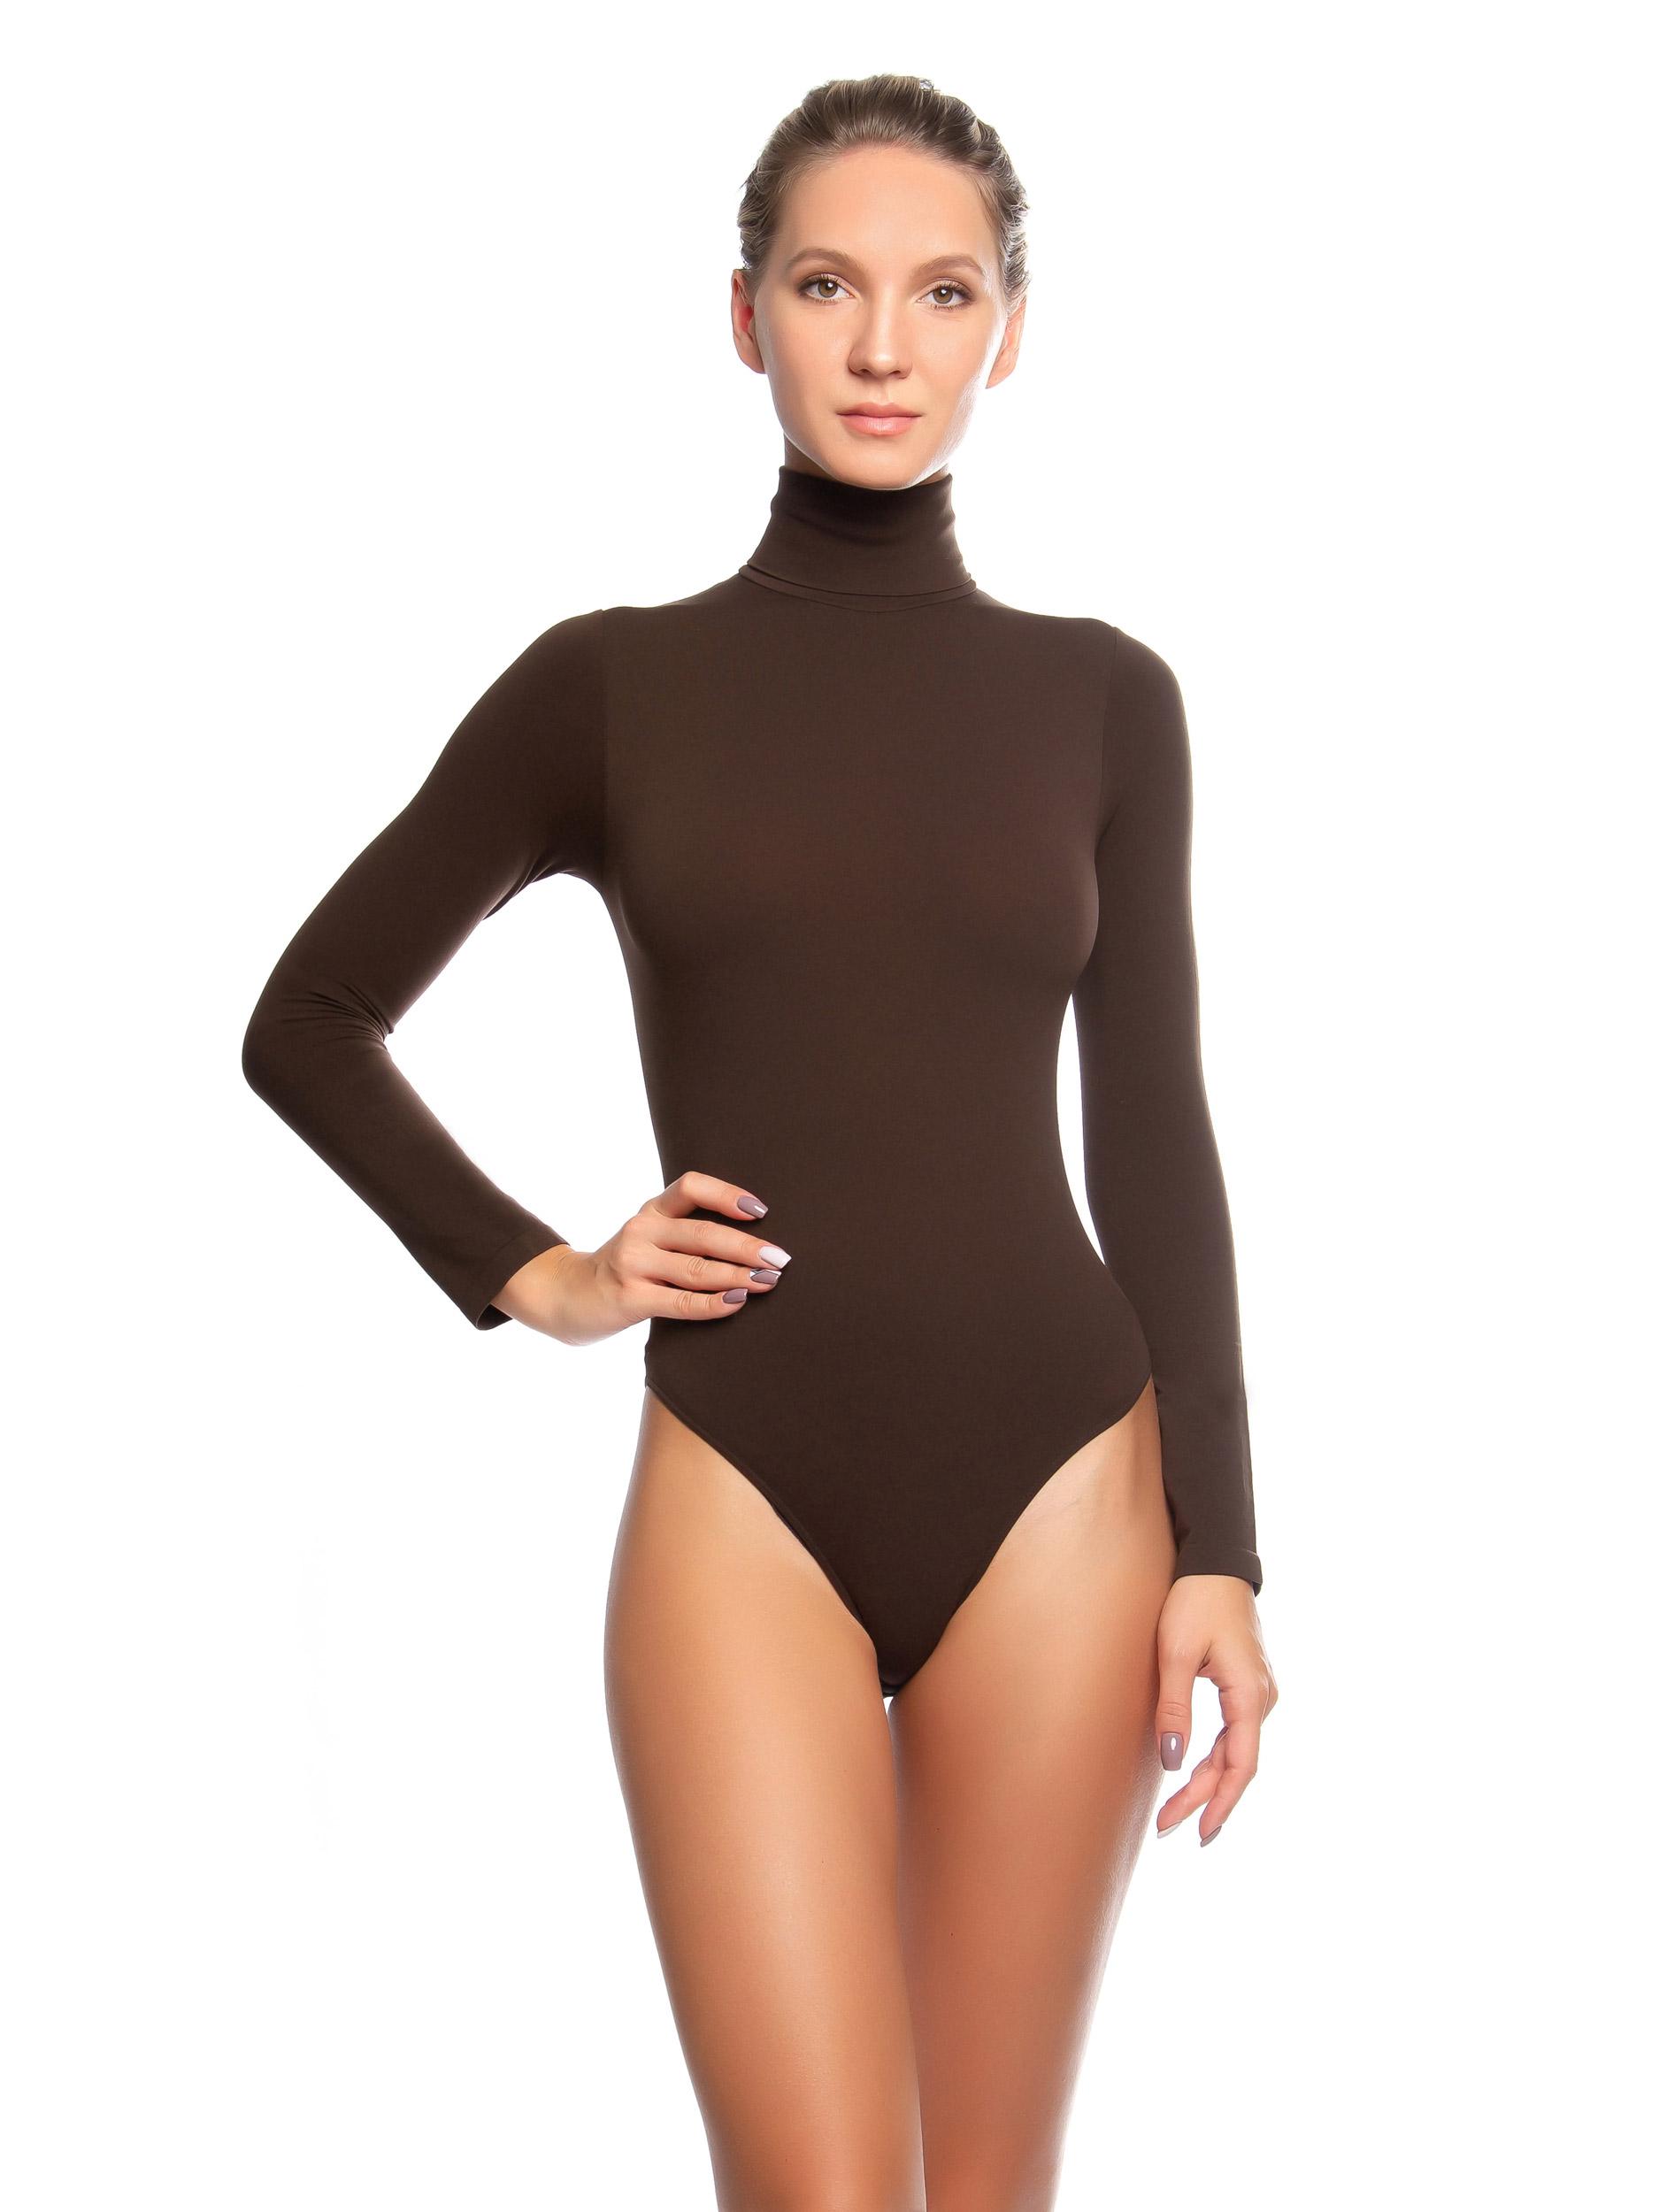 Боди женское Mademoiselle Body Dolcevita ML (Ilar) коричневое L/XL